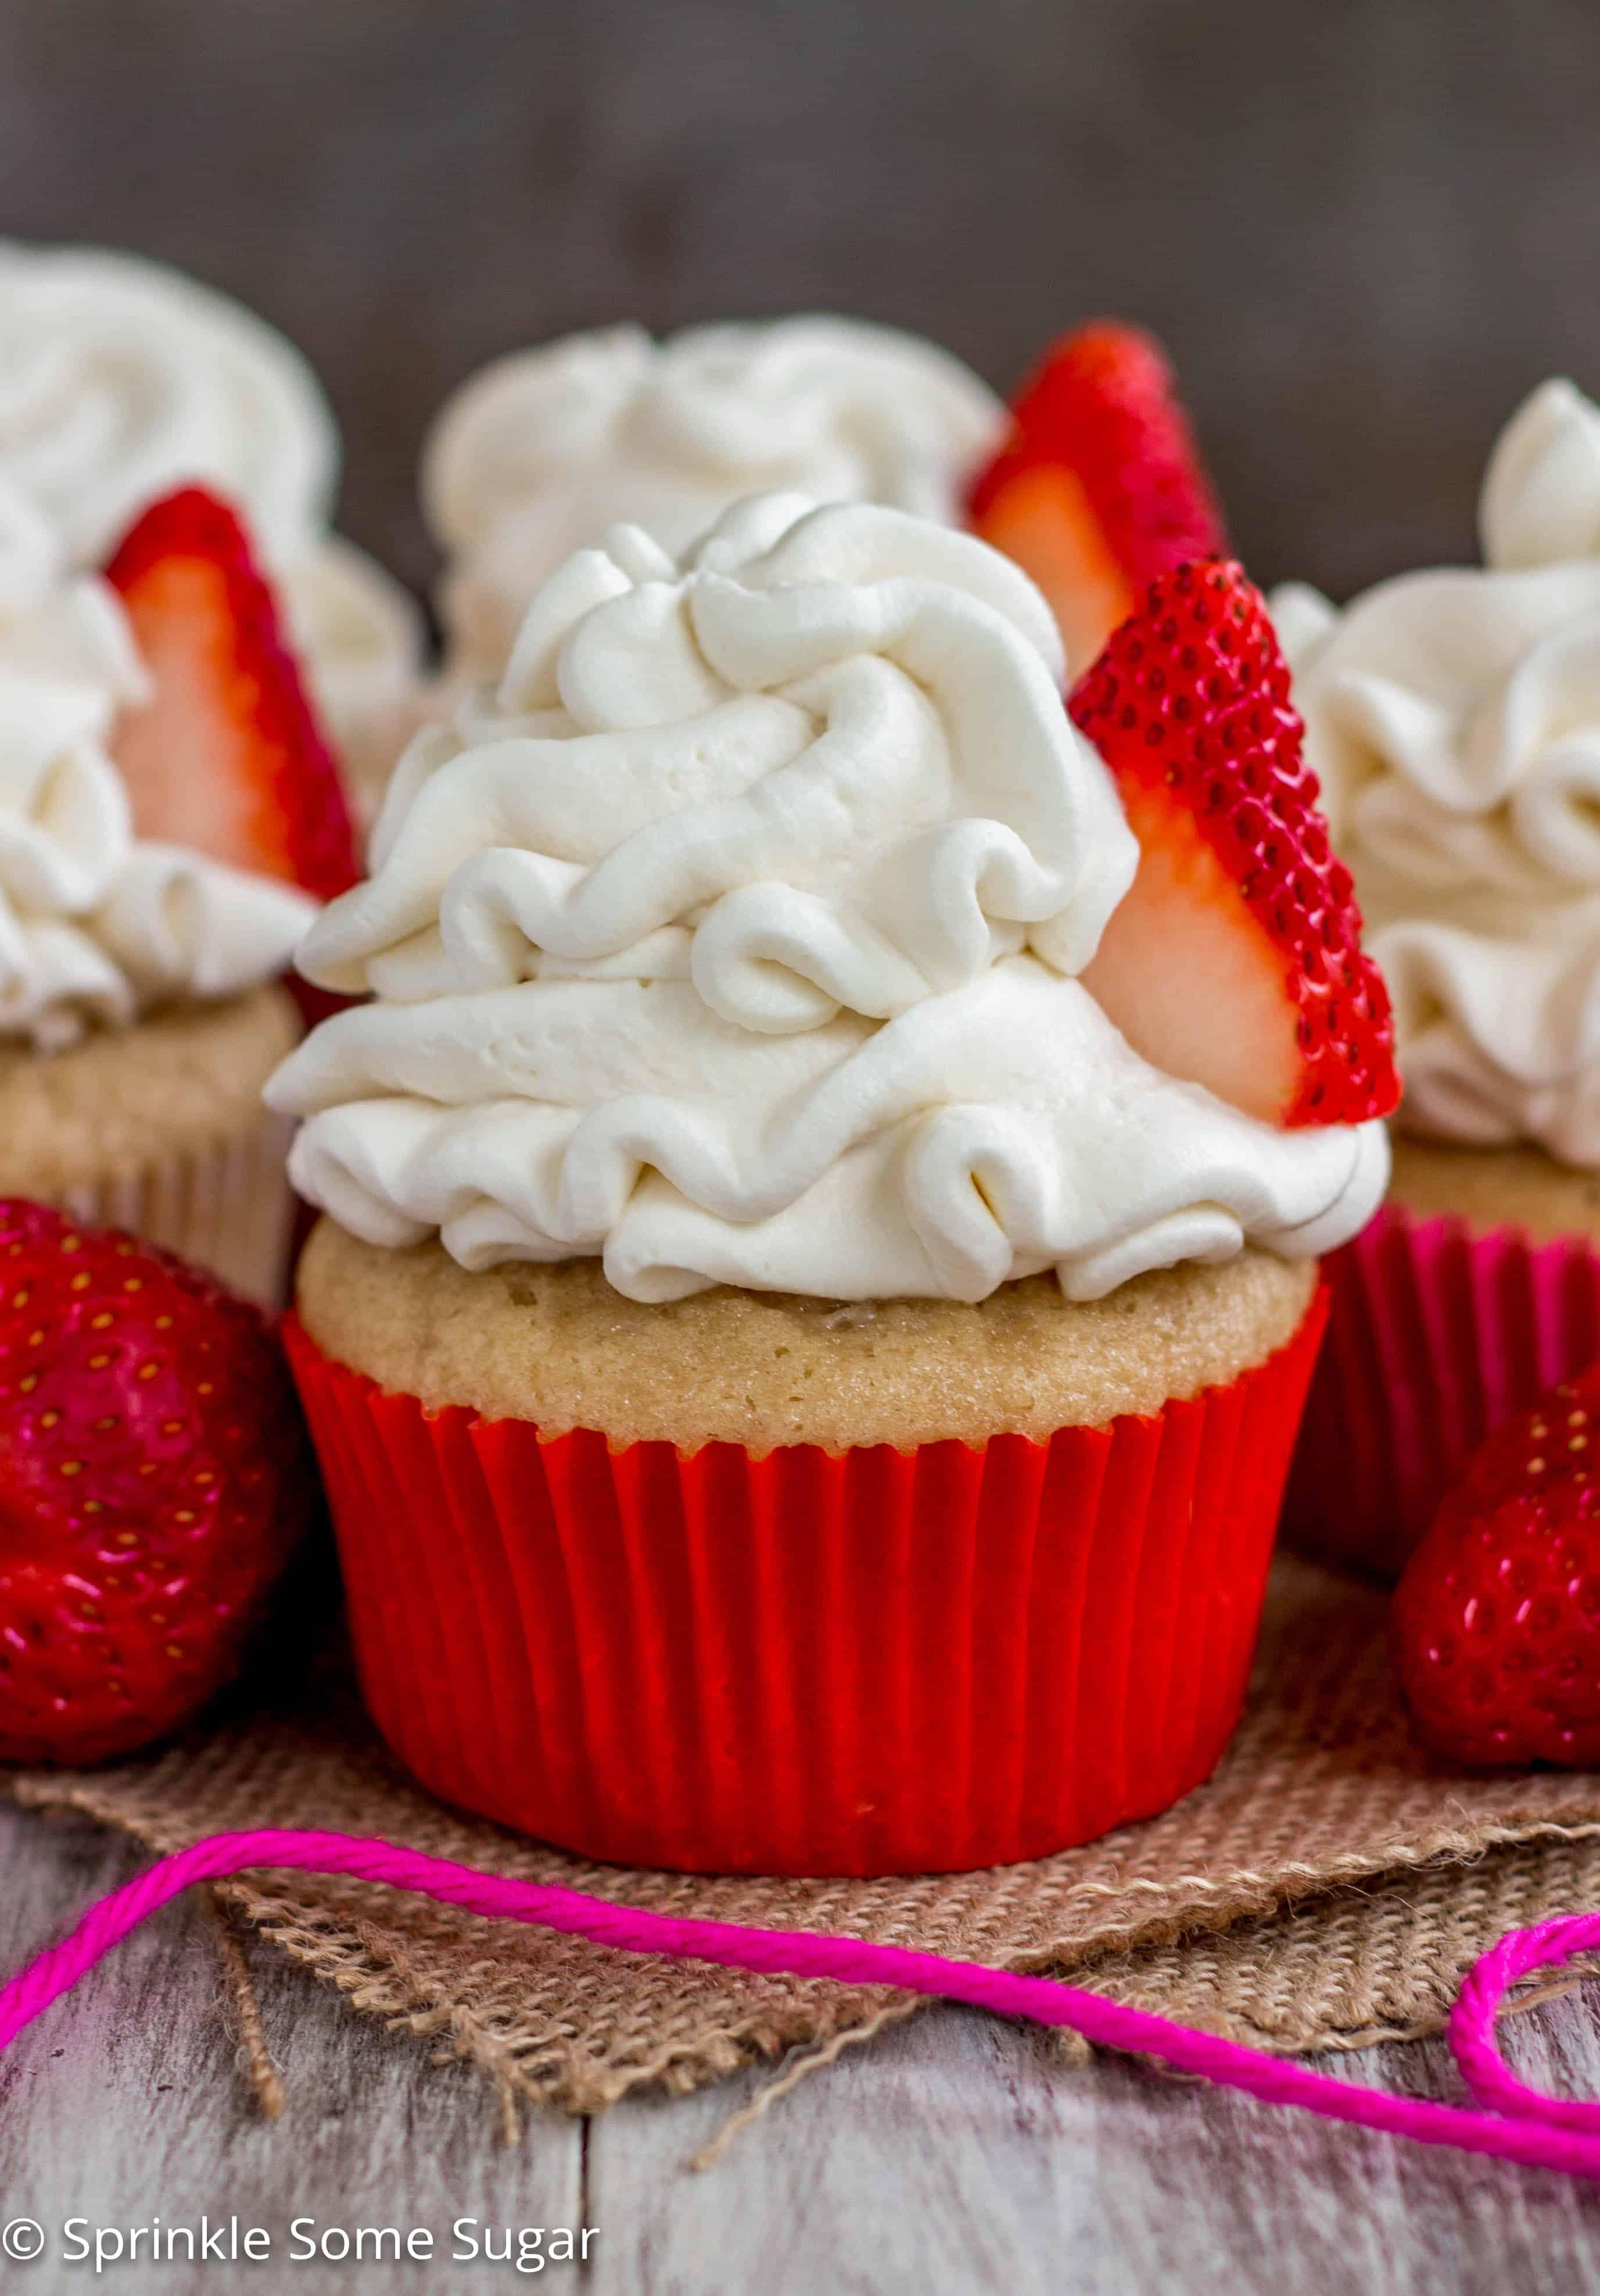 Strawberry Shortcake Cupcakes - Sprinkle Some Sugar